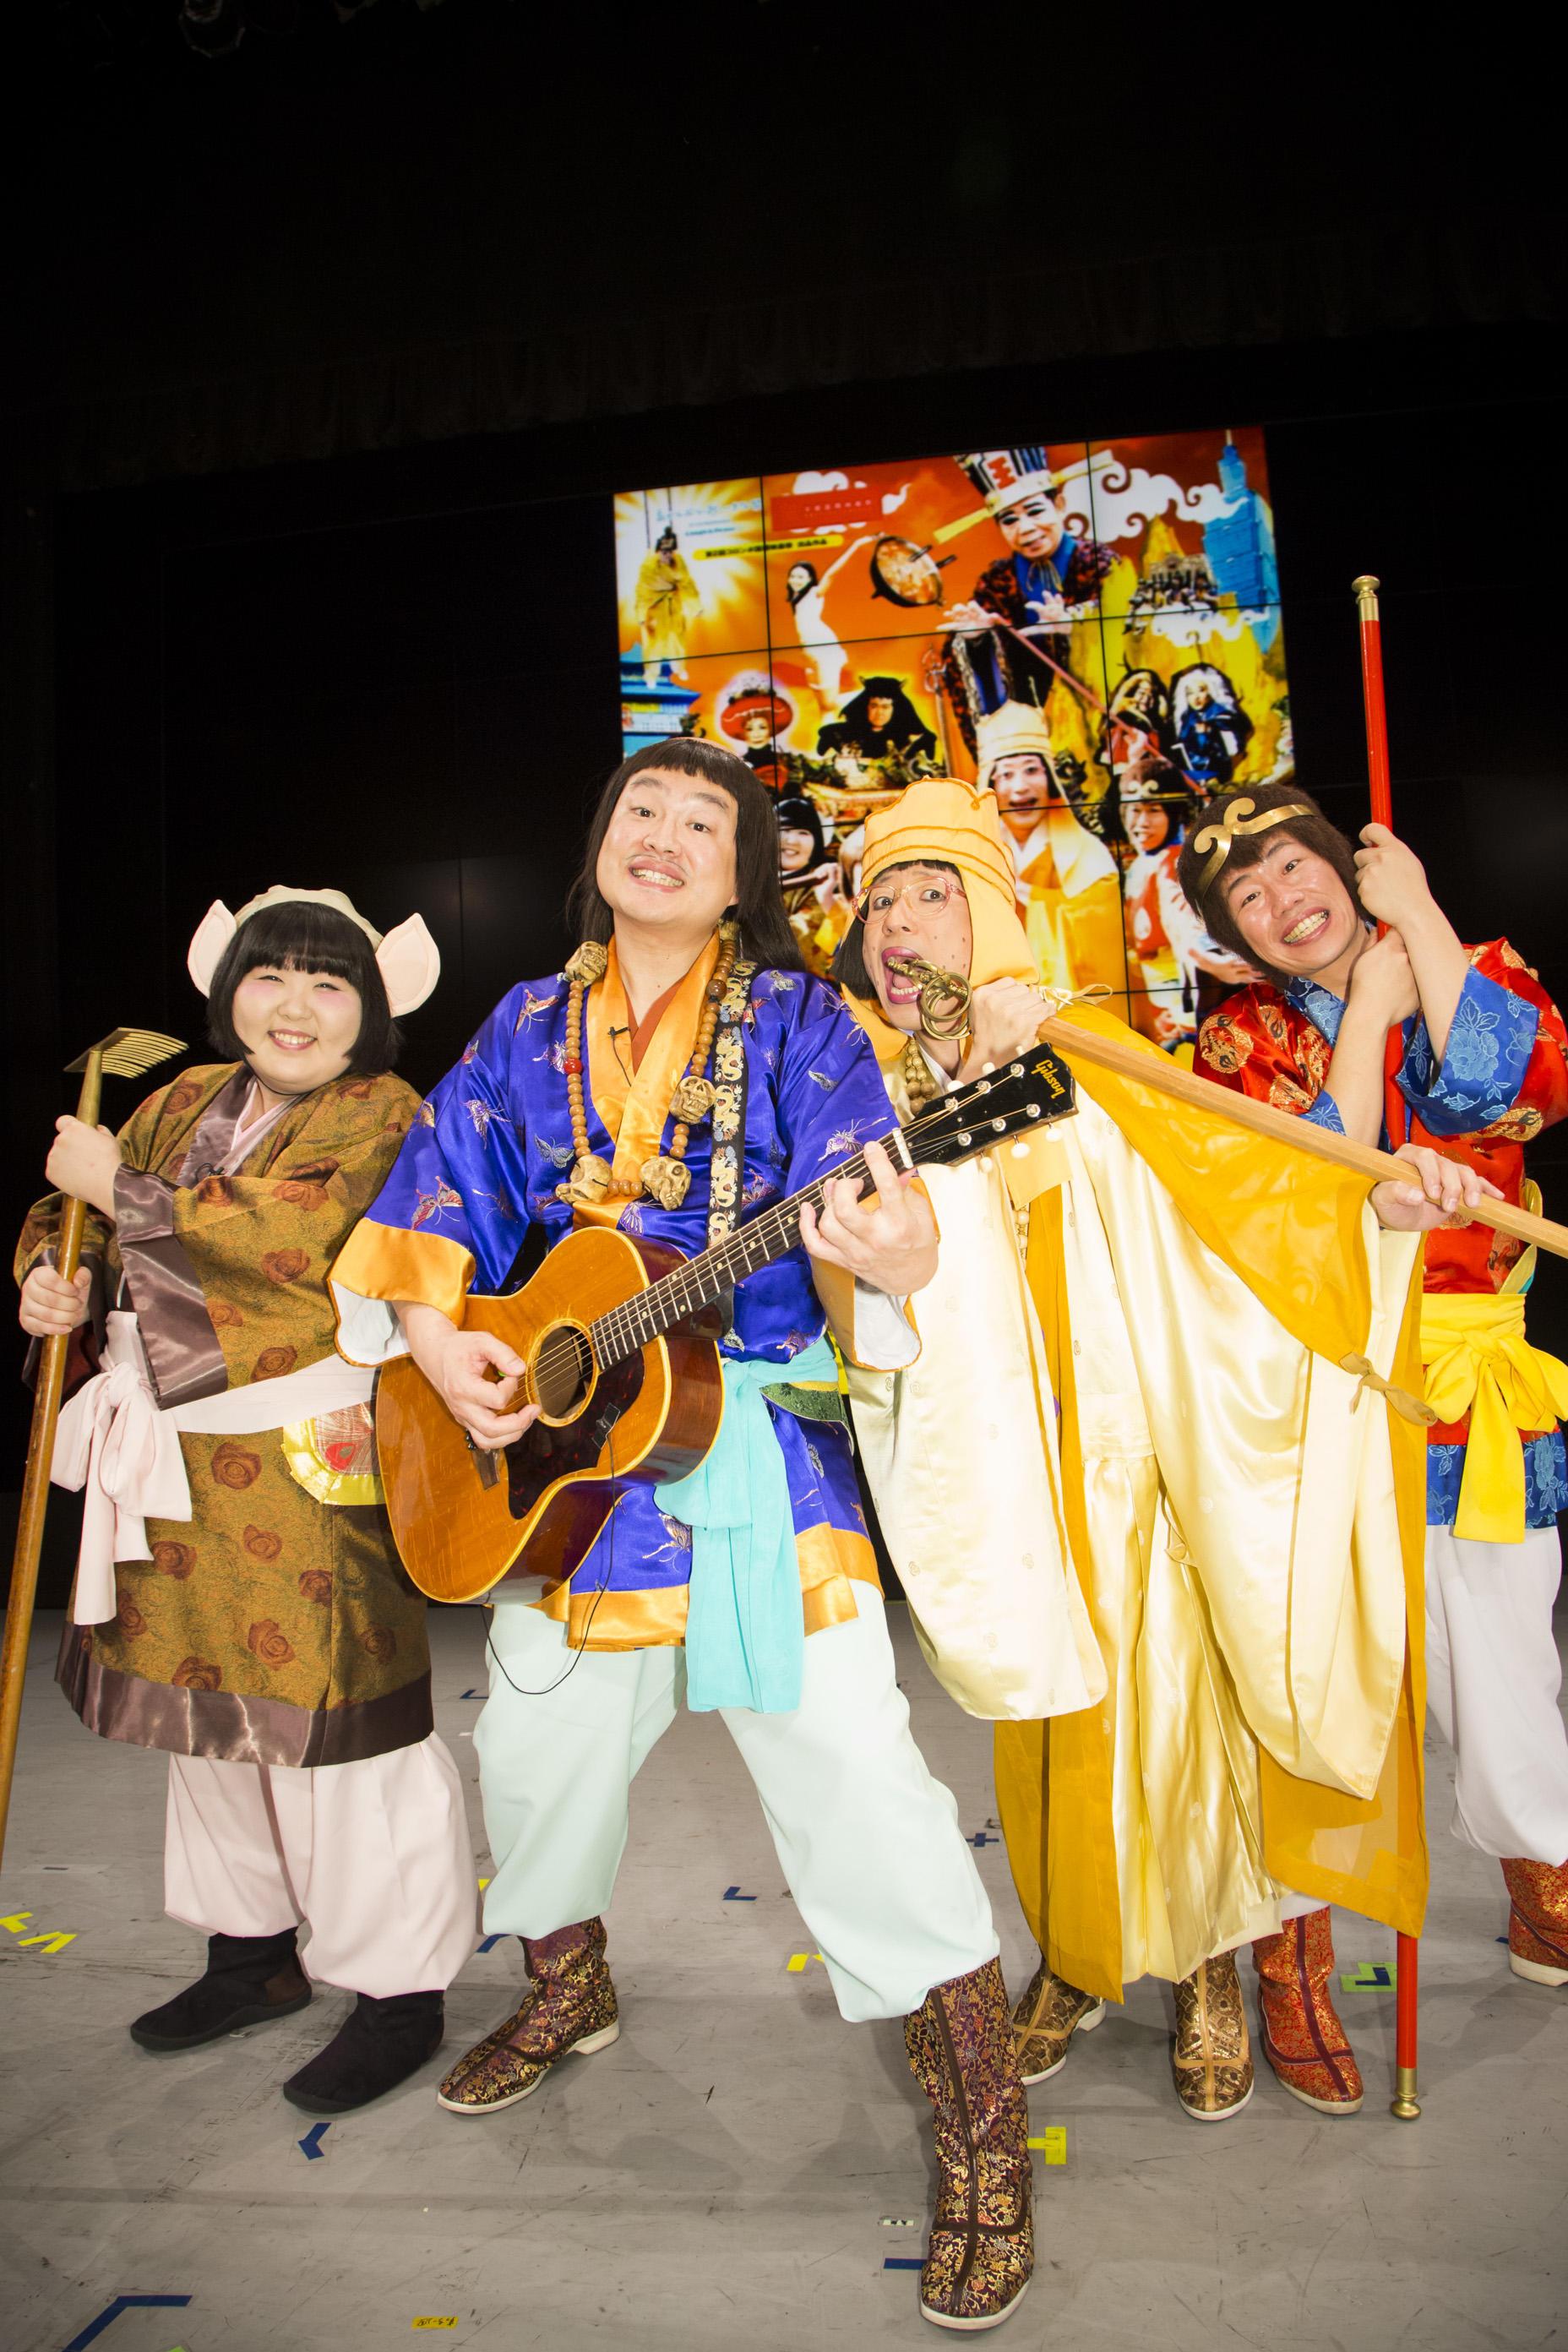 http://news.yoshimoto.co.jp/20151203163001-e2ed519ef073419a39a6e4bf25a5c2607cf03c4c.jpg